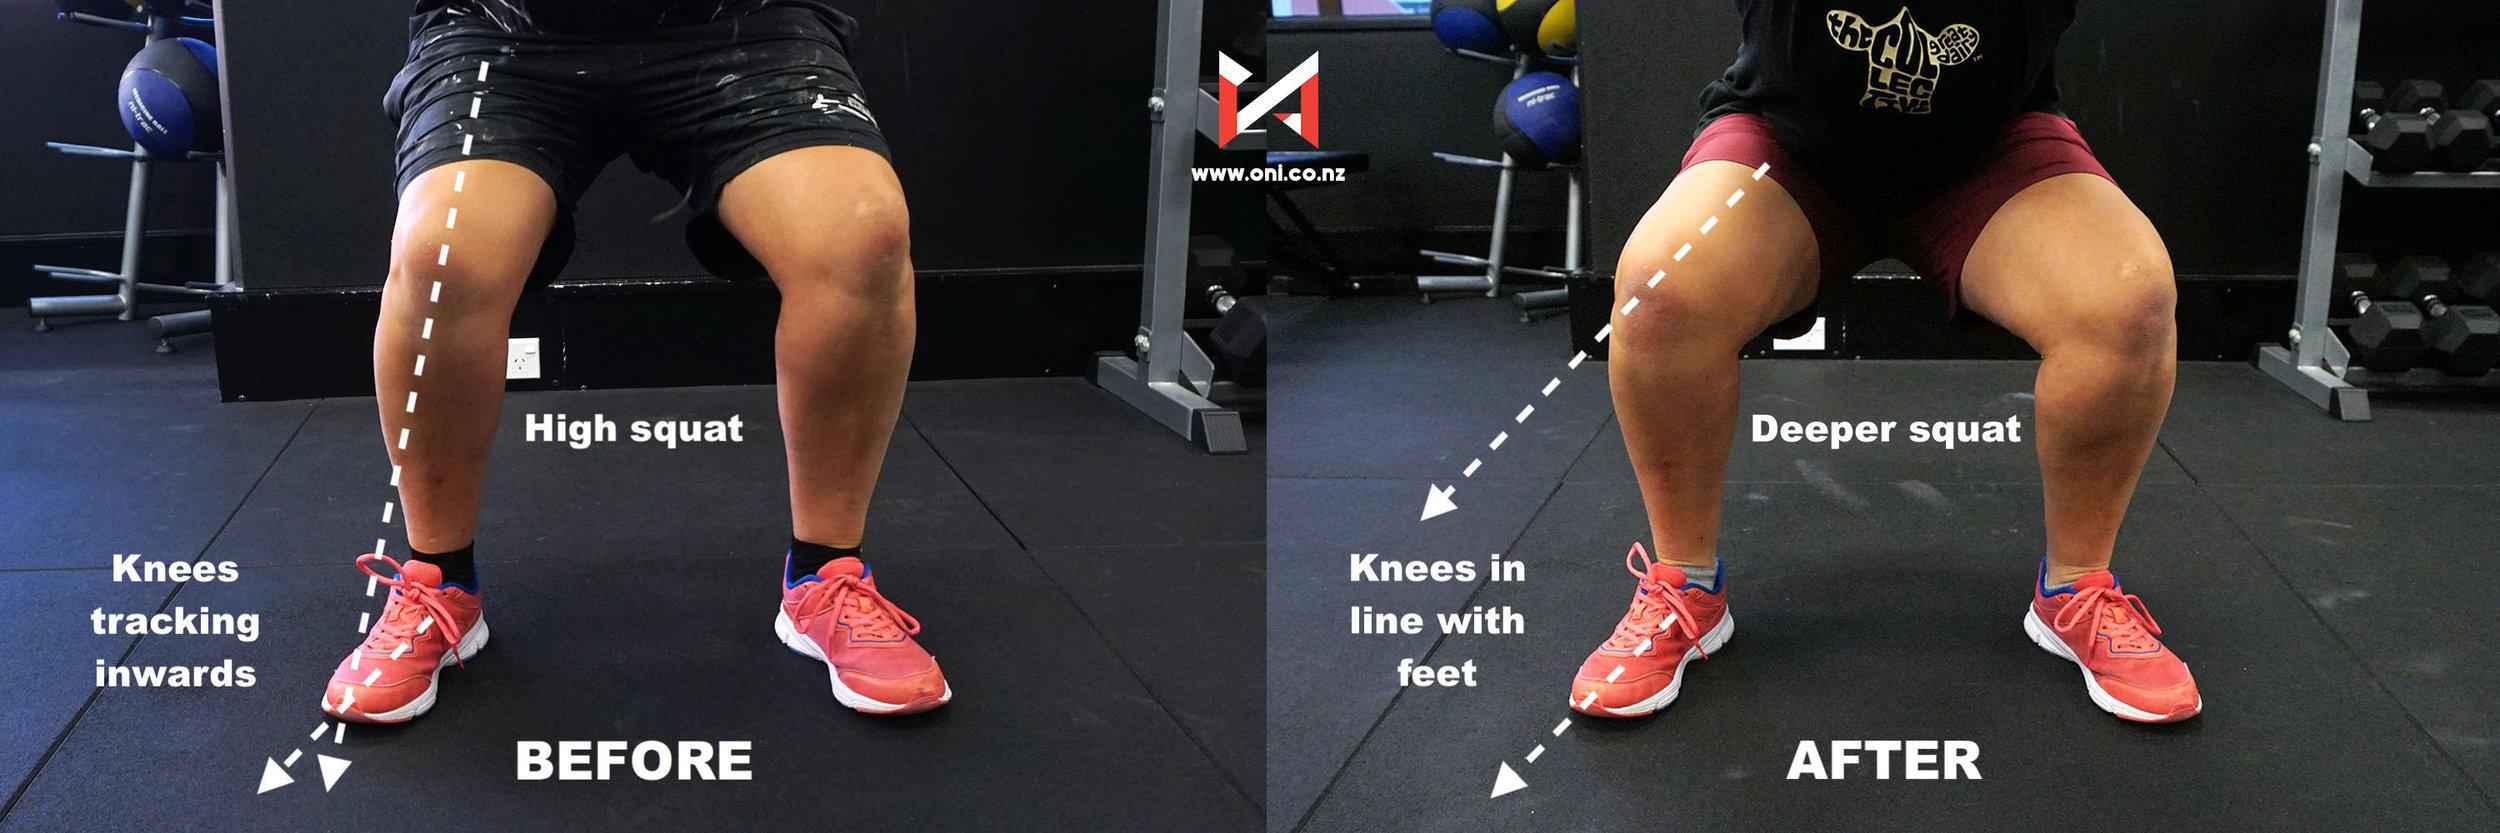 teknik i styrketræning